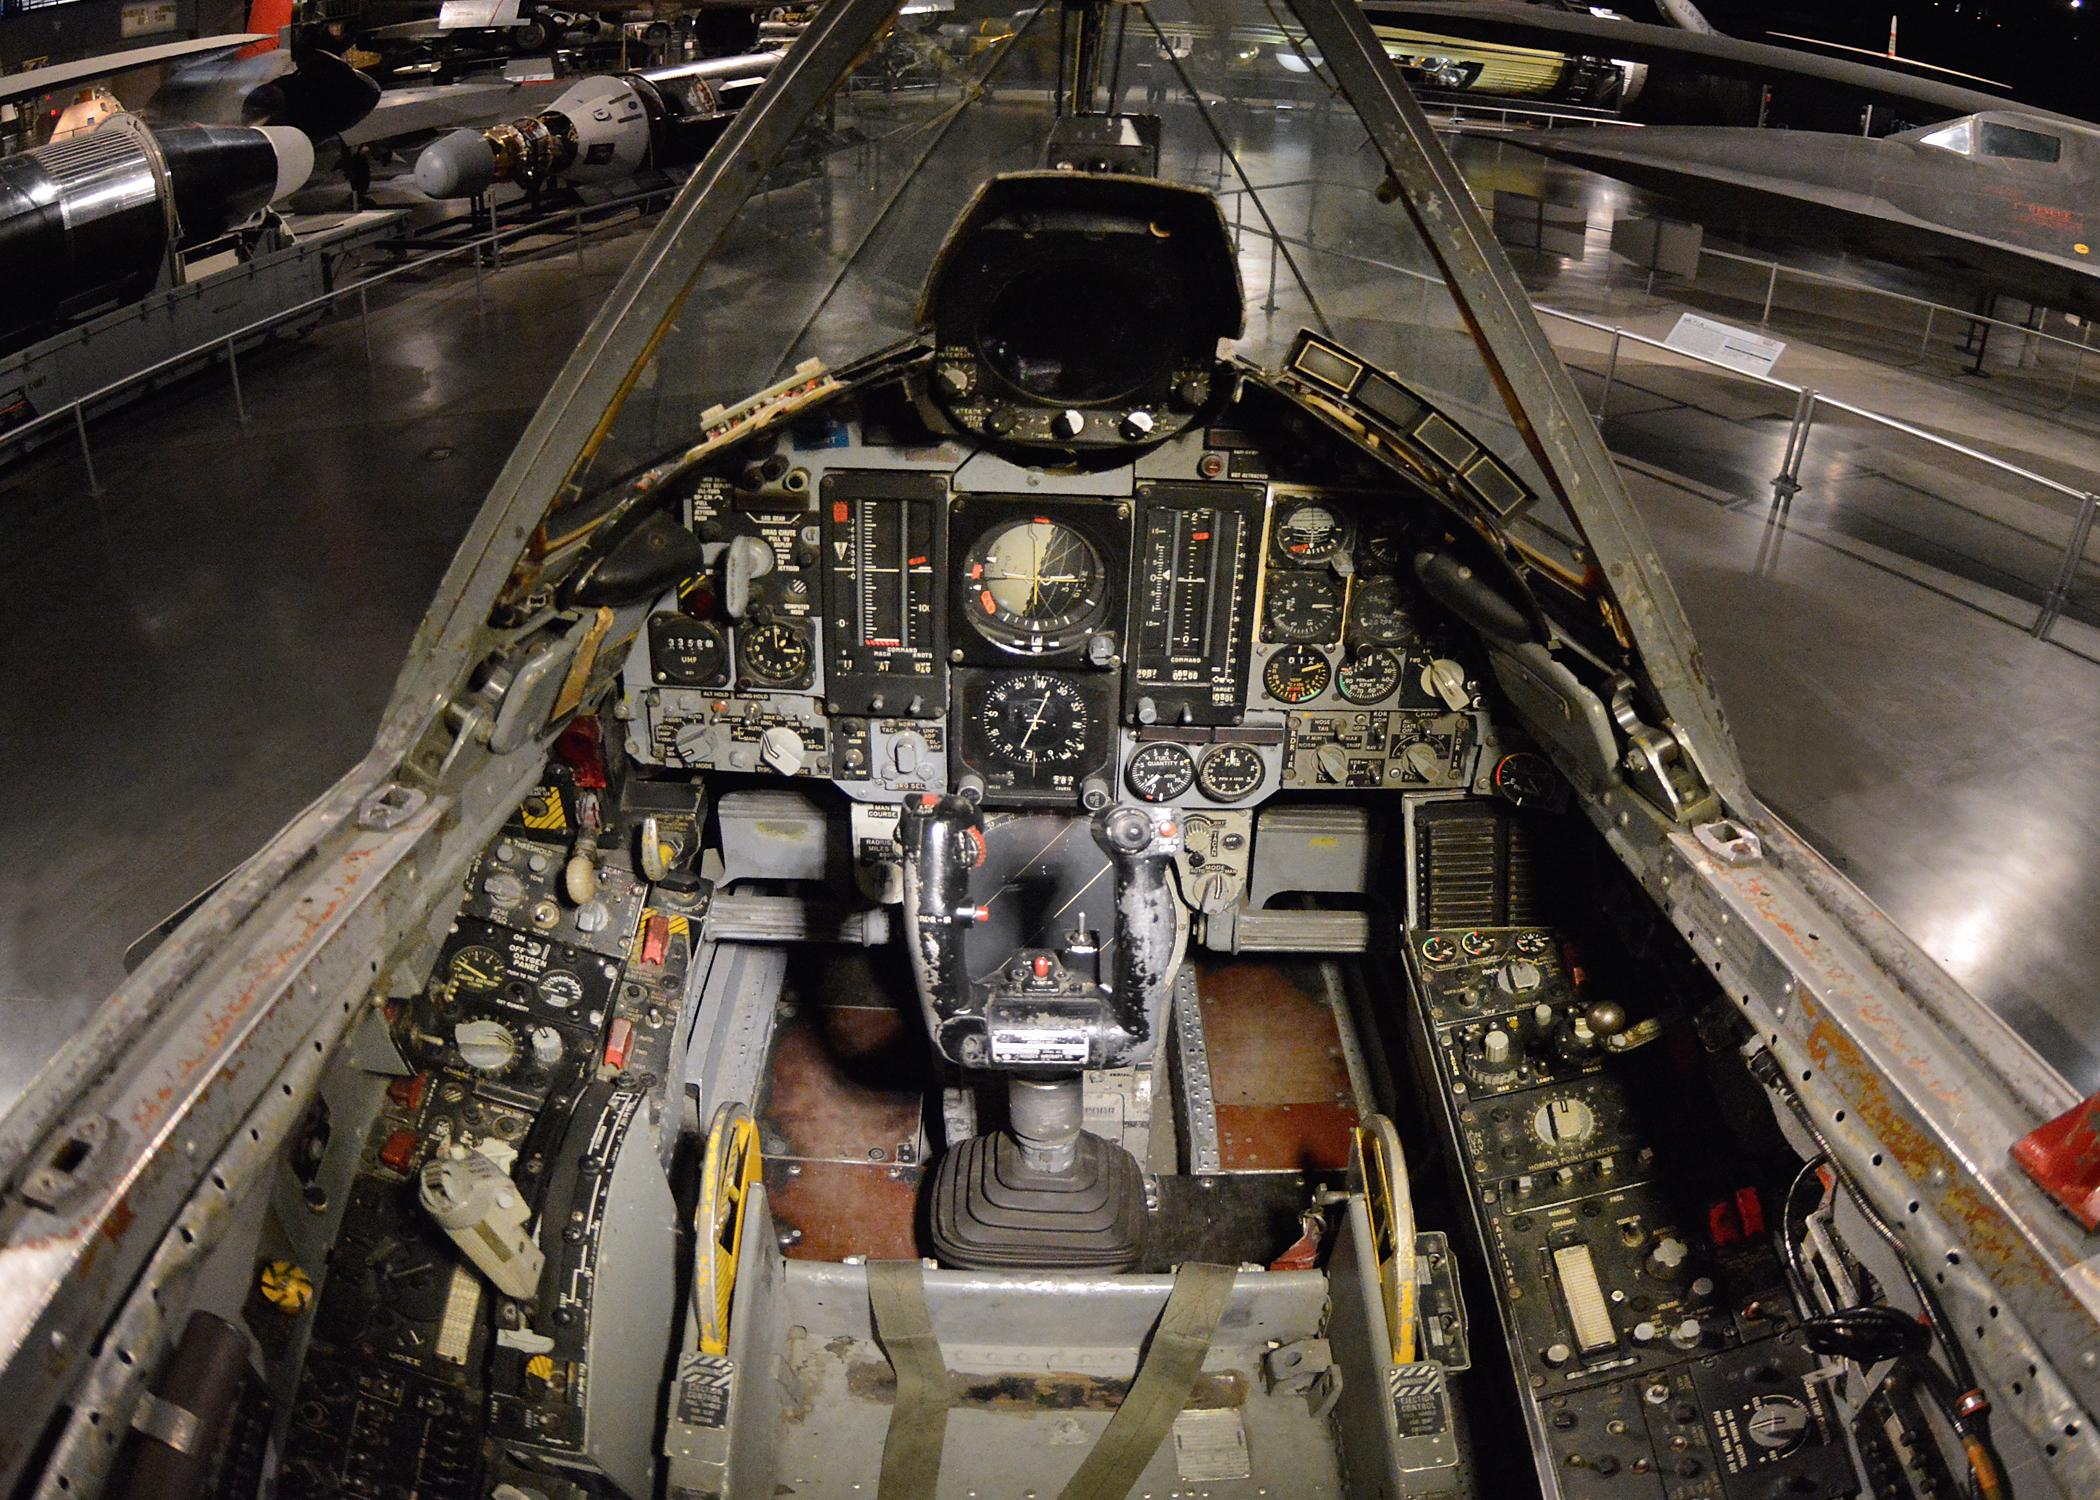 We asked a private-jet interior designer to judge 8 fighter cockpits